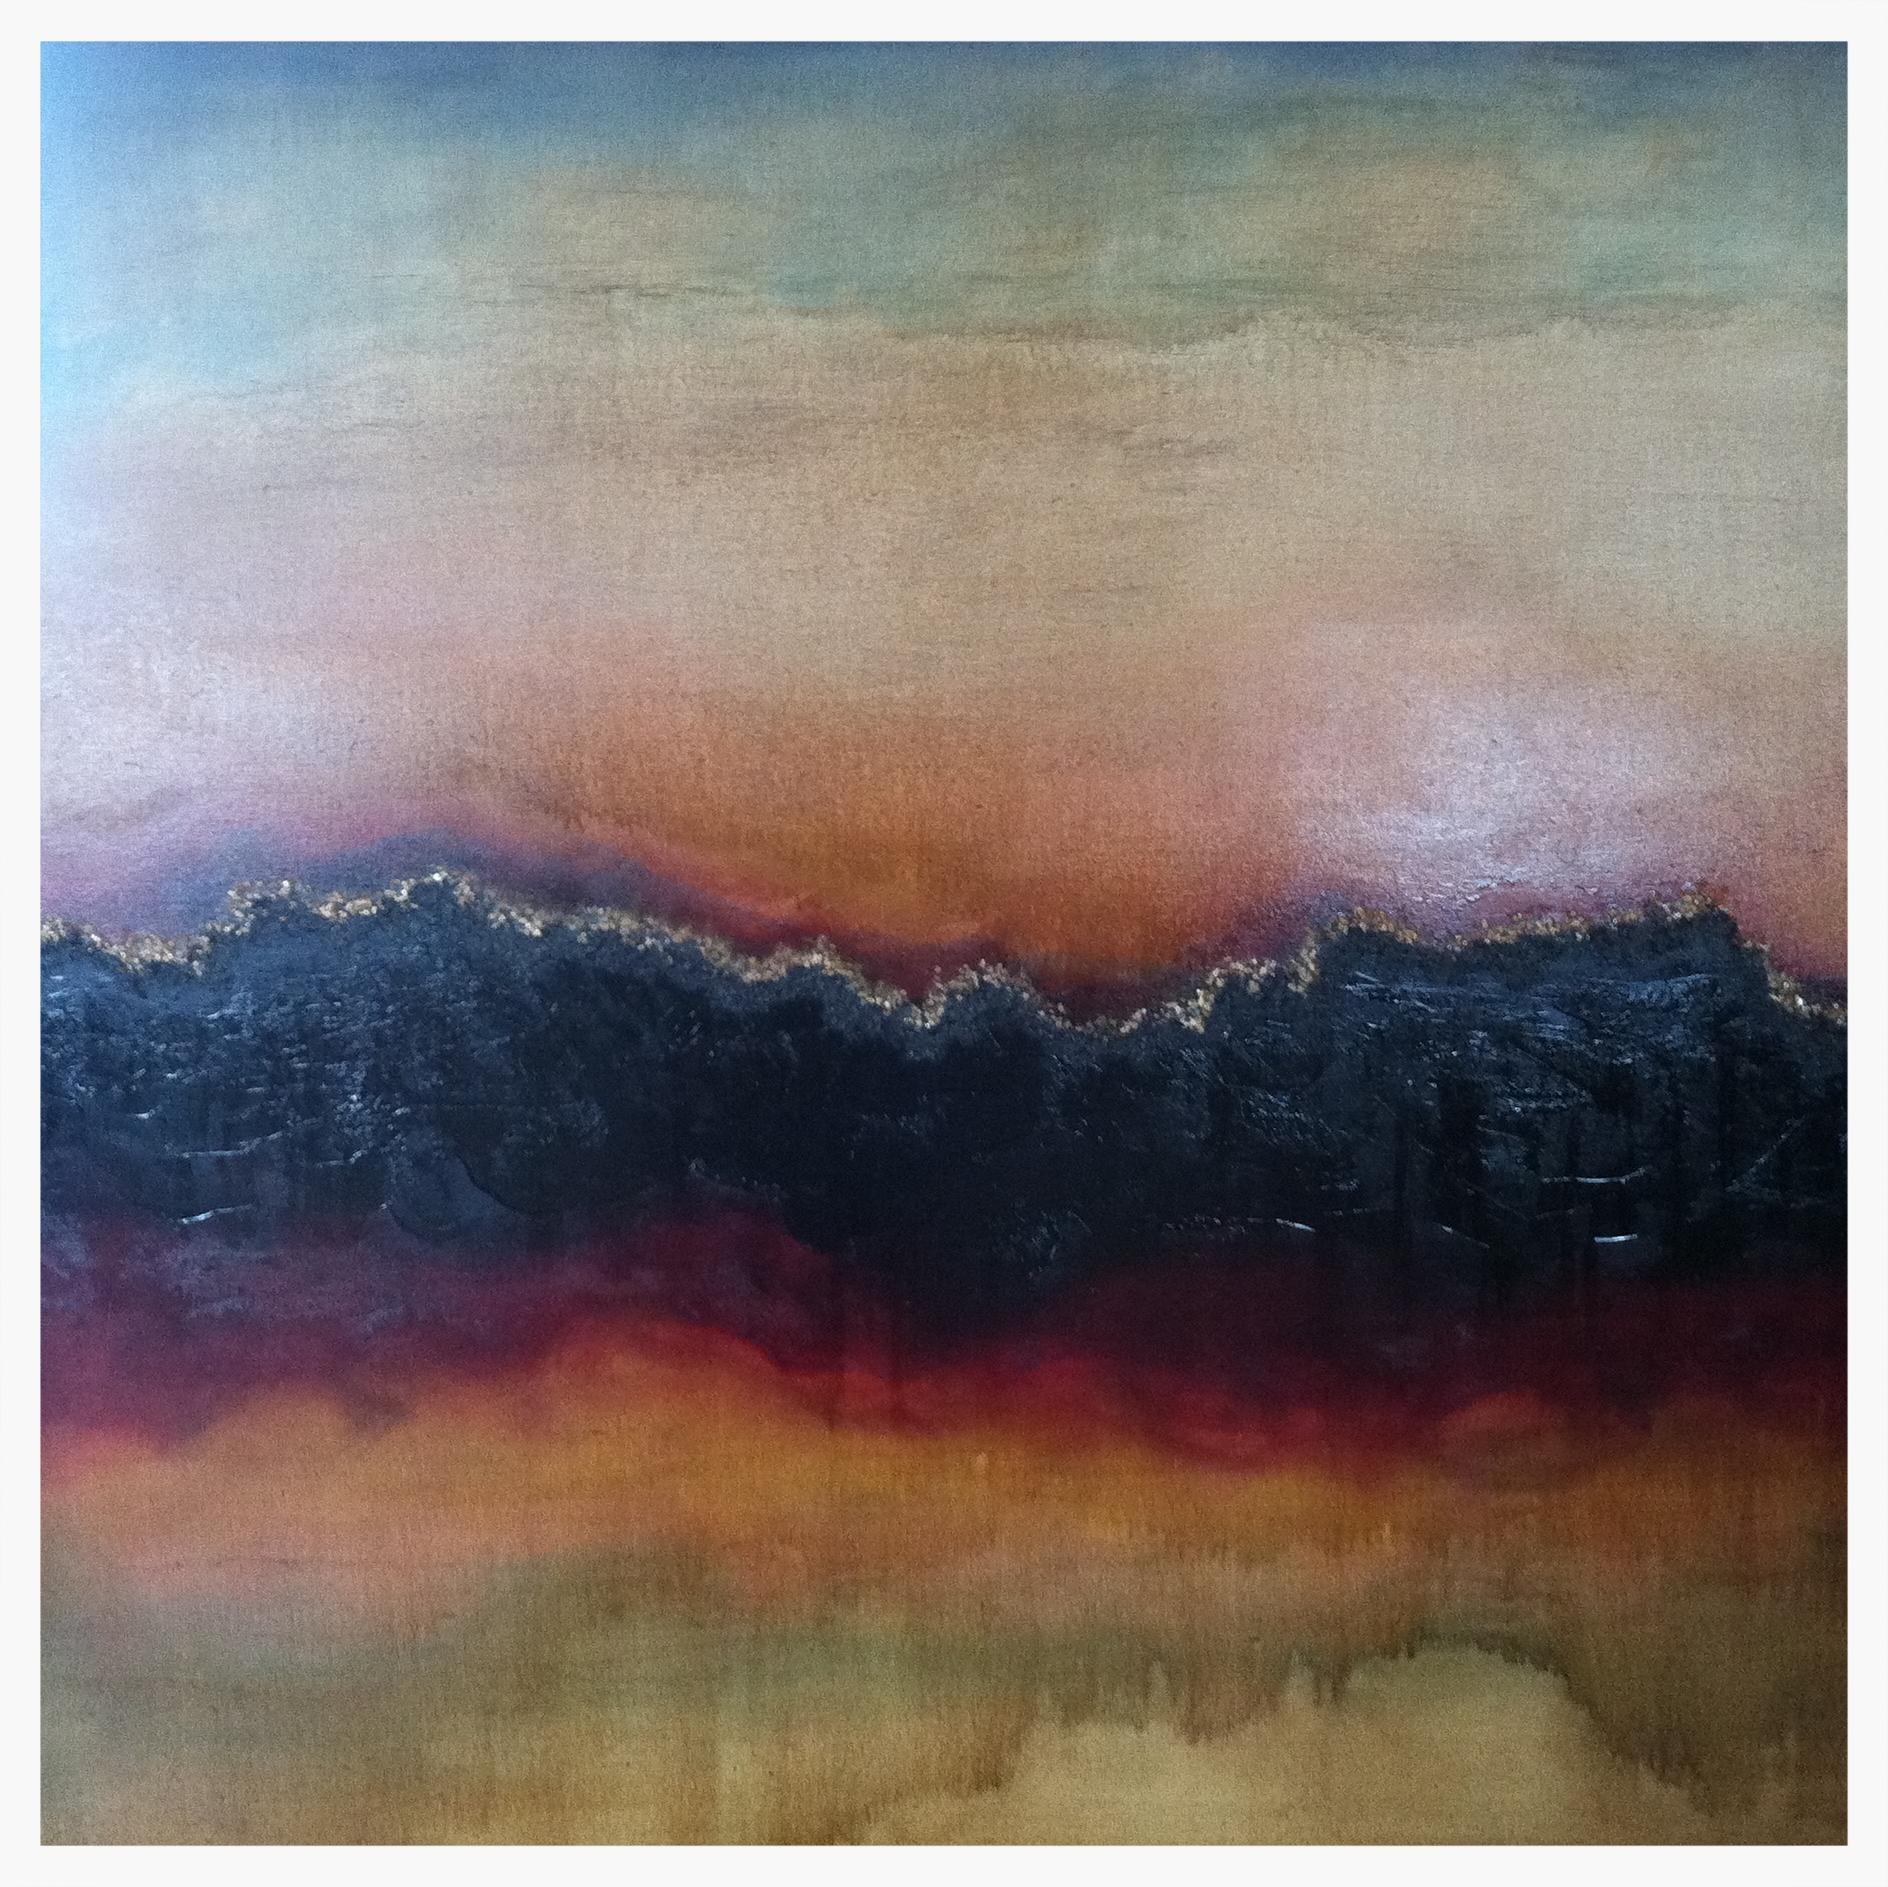 "#5450 Canvas Size: 48"" x 48"" (square)"